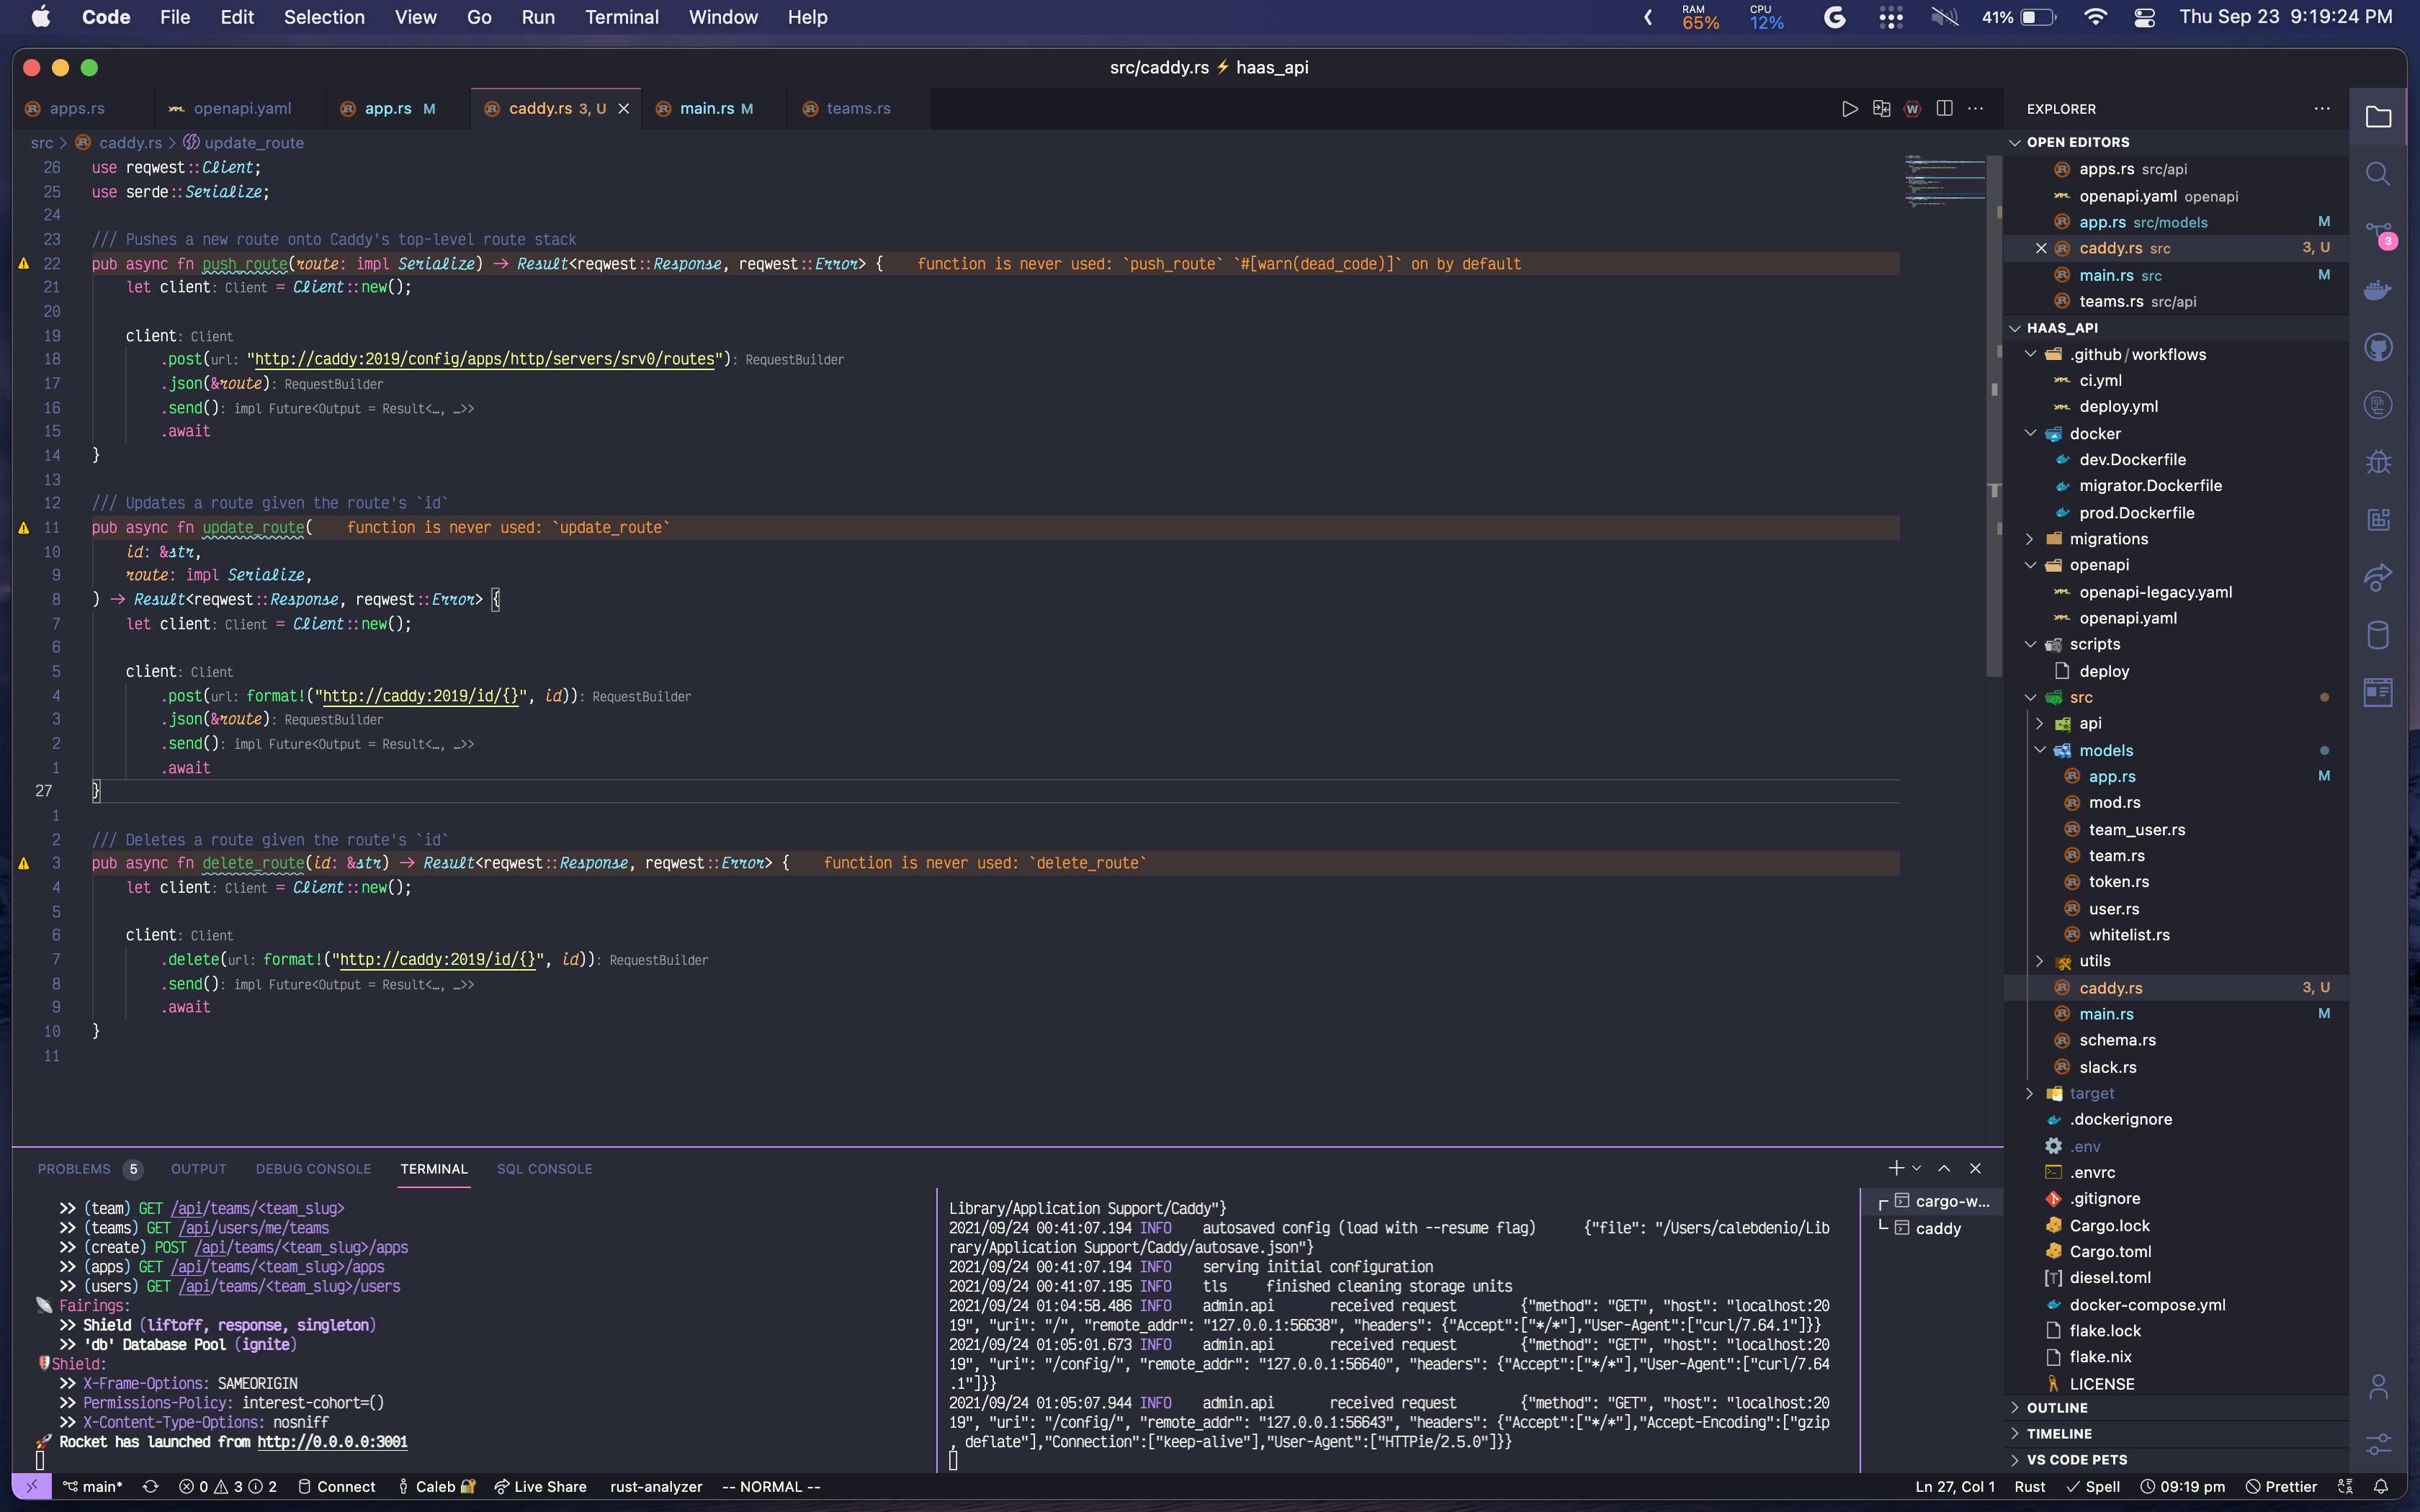 https://cloud-ofdd4a4n7-hack-club-bot.vercel.app/0screen_shot_2021-09-23_at_9.19.24_pm.png